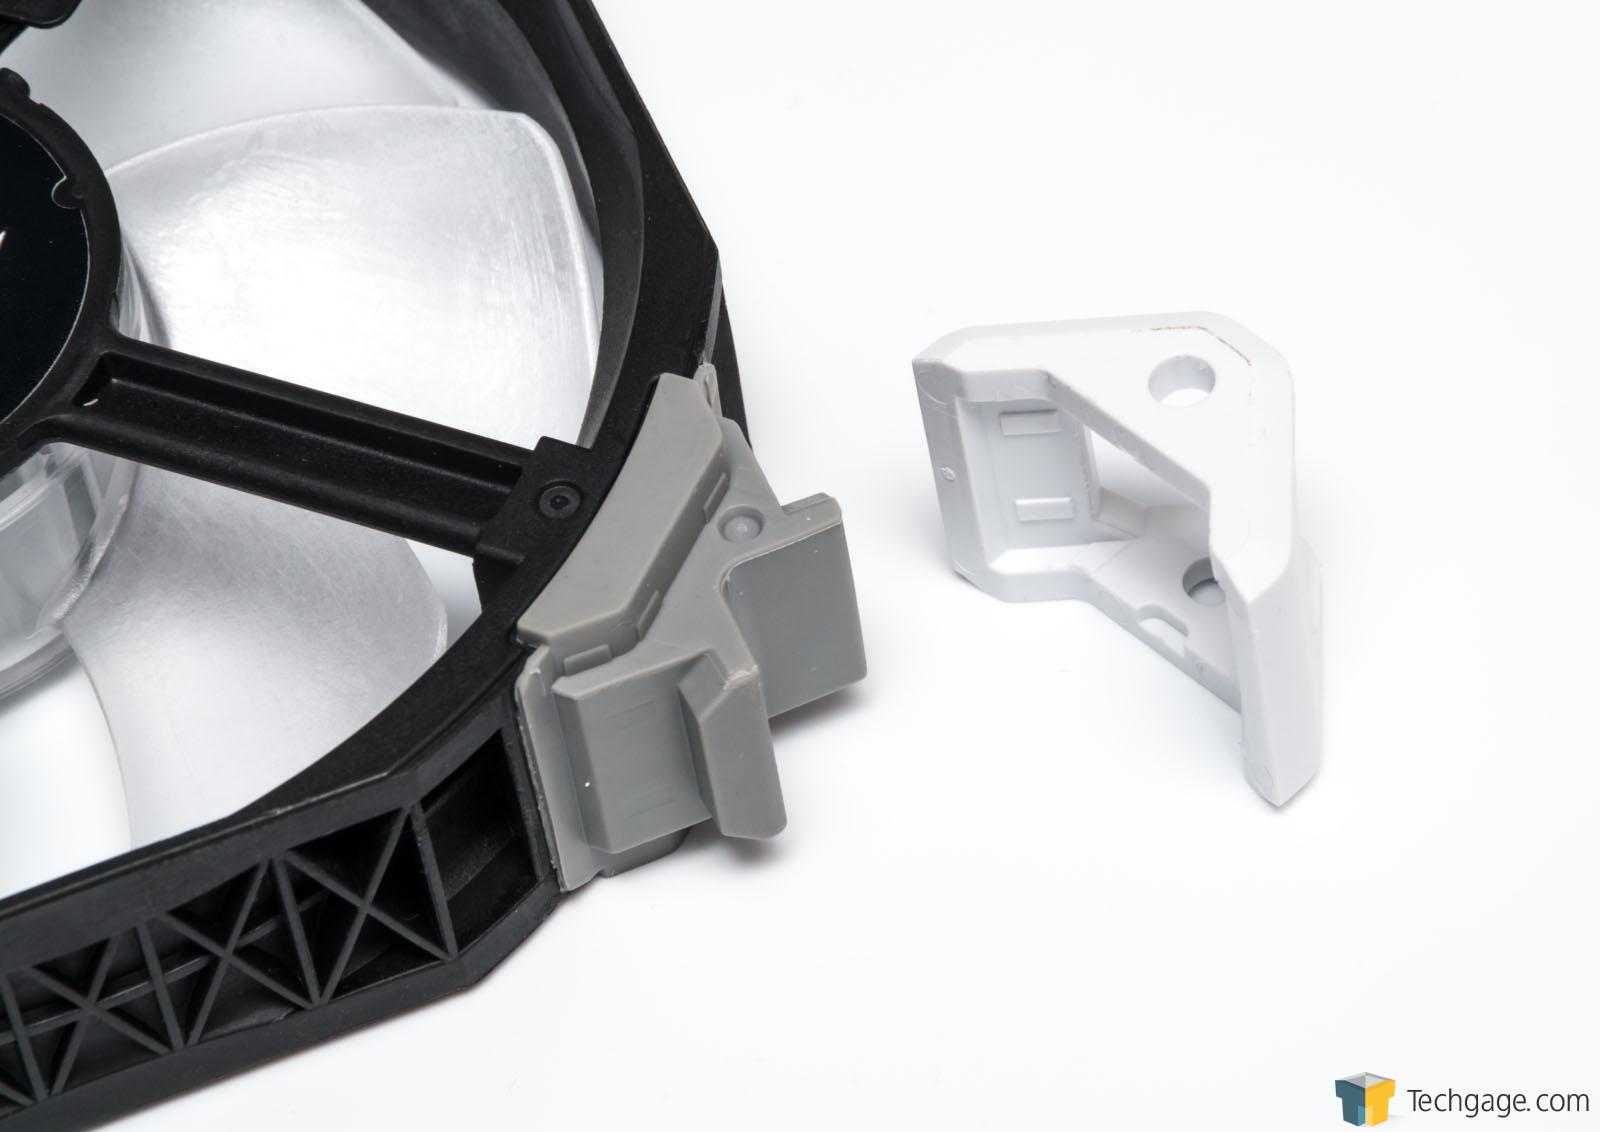 MagLev Comes To Desktop: Corsair Magnetic Levitation ML120 & ML140